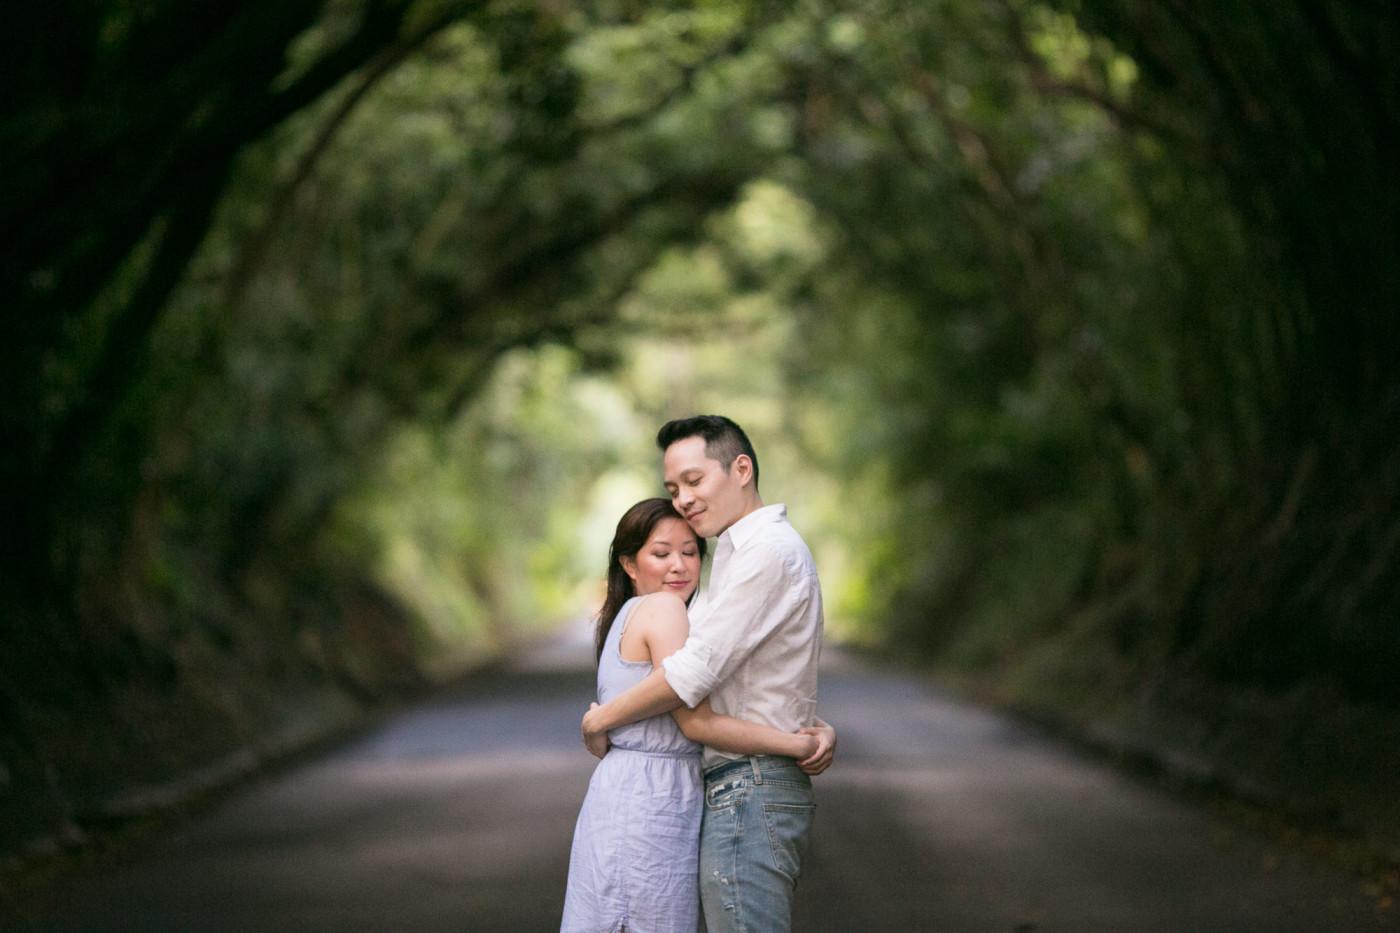 2015-10-01-Jordana-&-Ric's-Engagement-0026